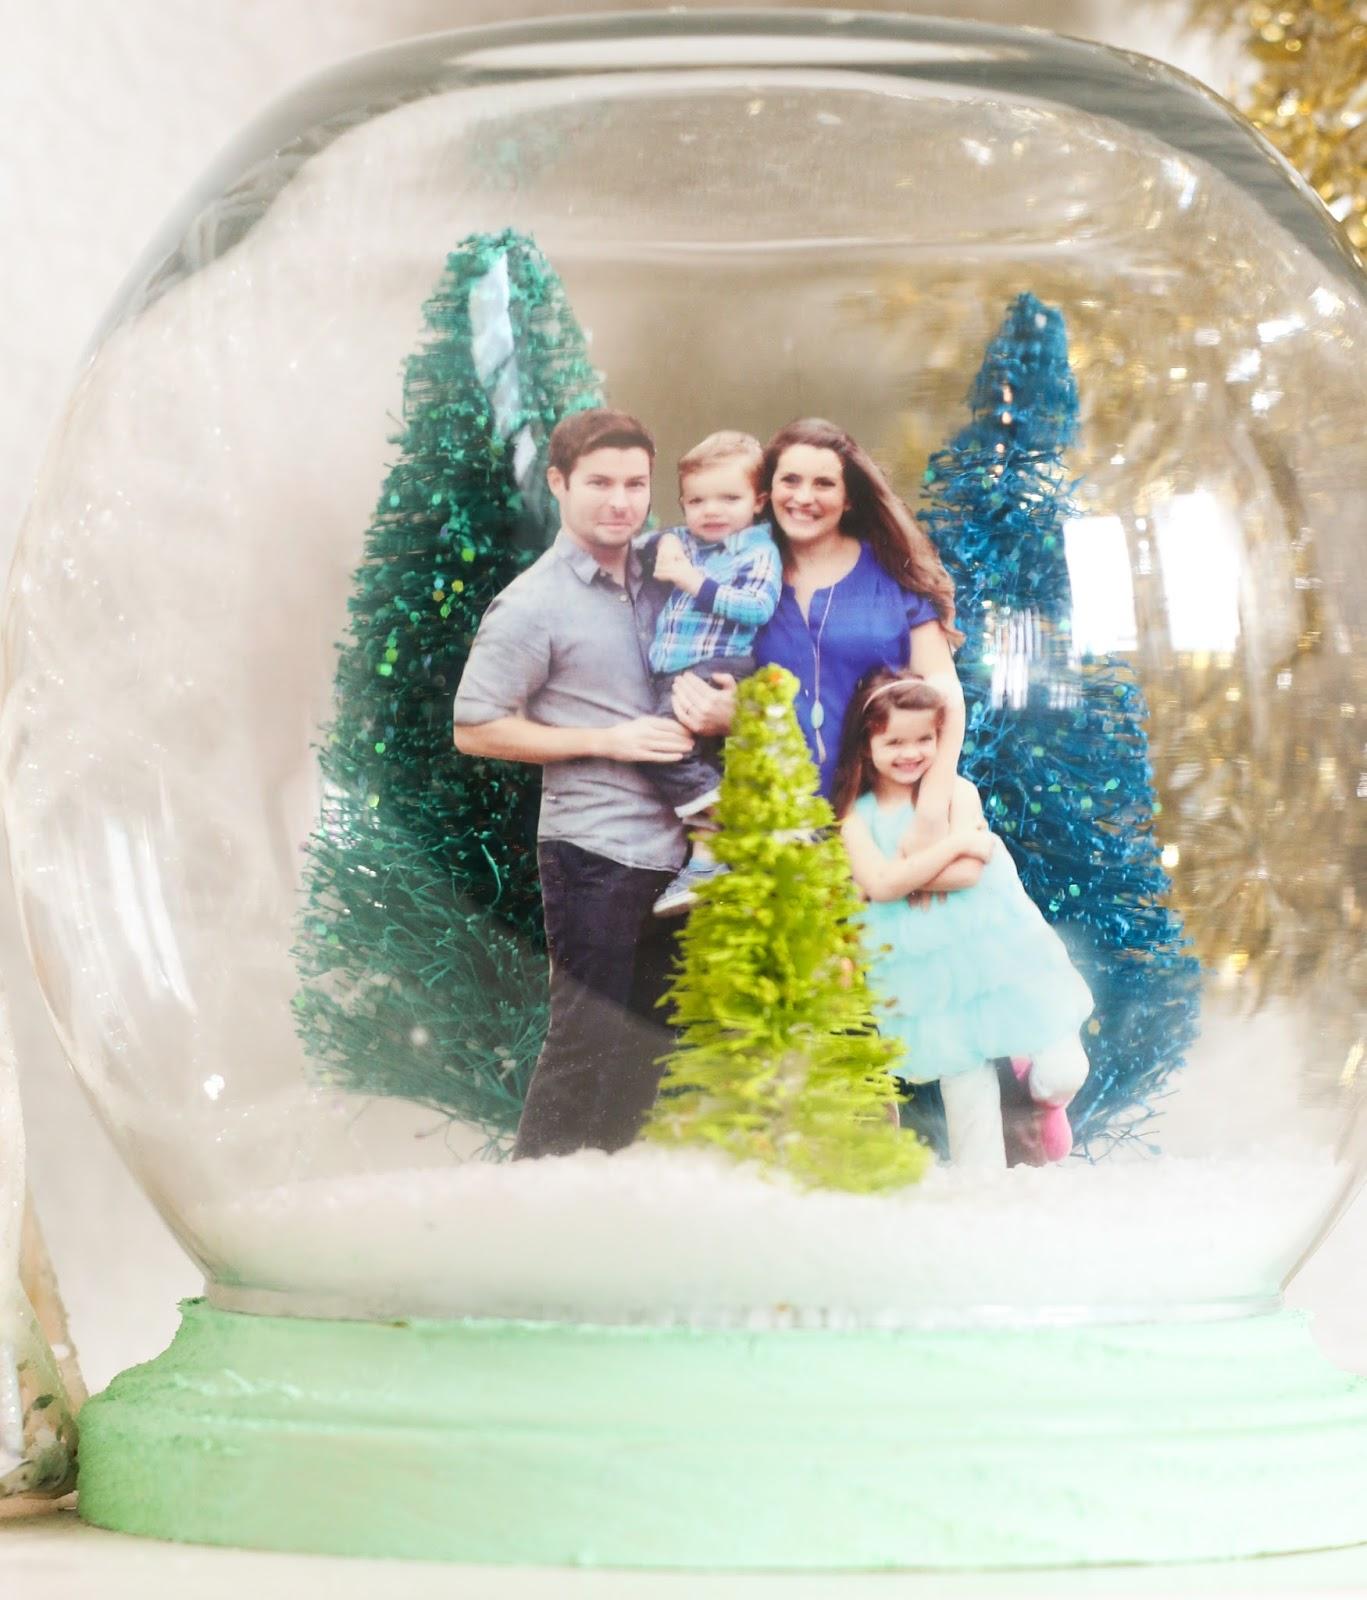 craft it a family portrait snow globe